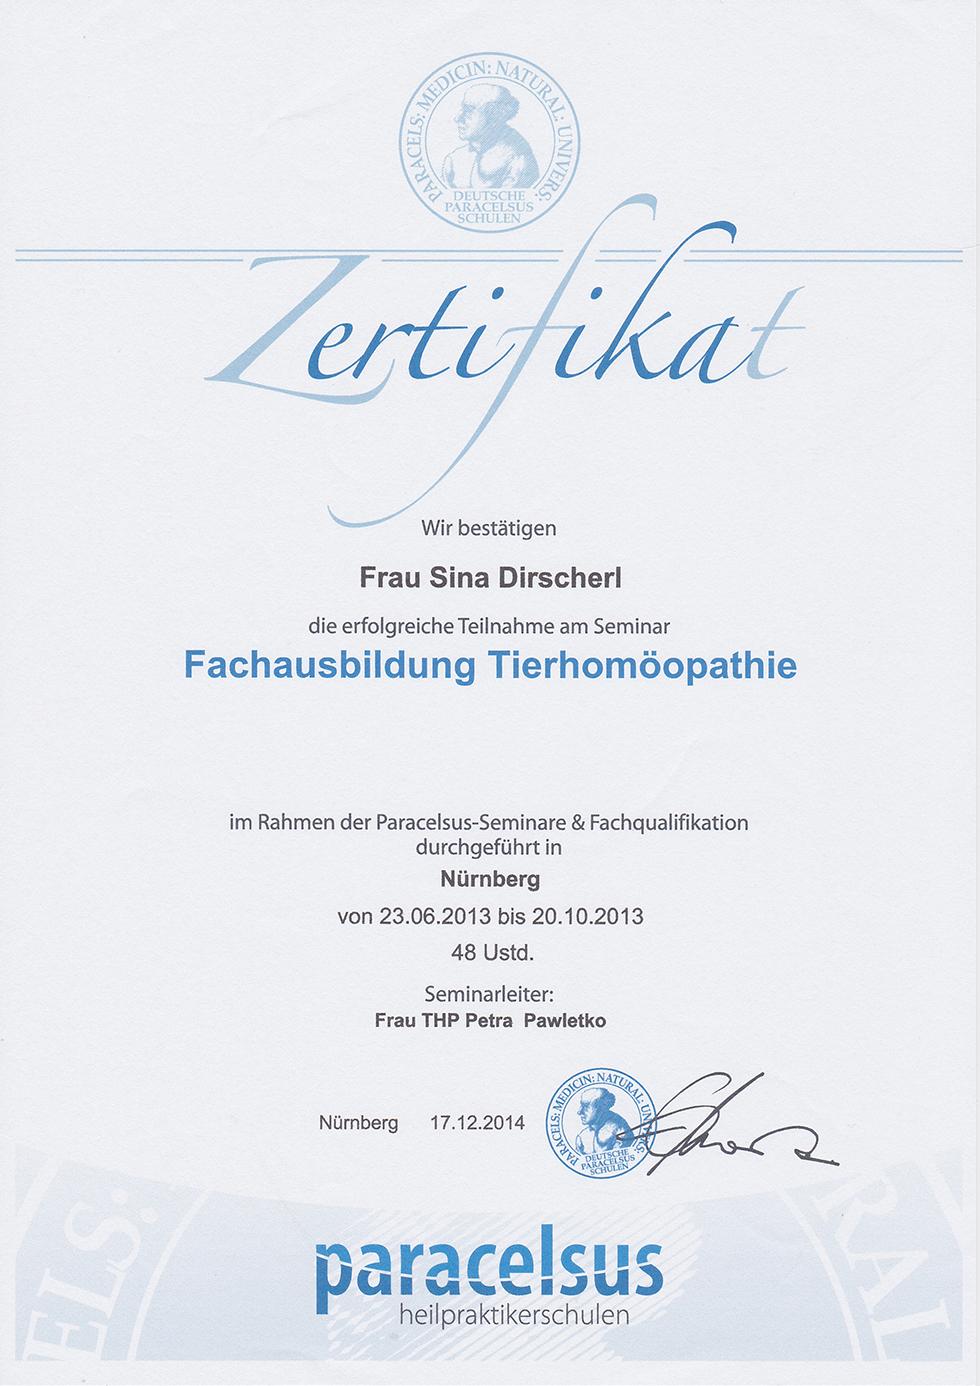 Zertifikat - Fachausbildung Tierhomöopathie